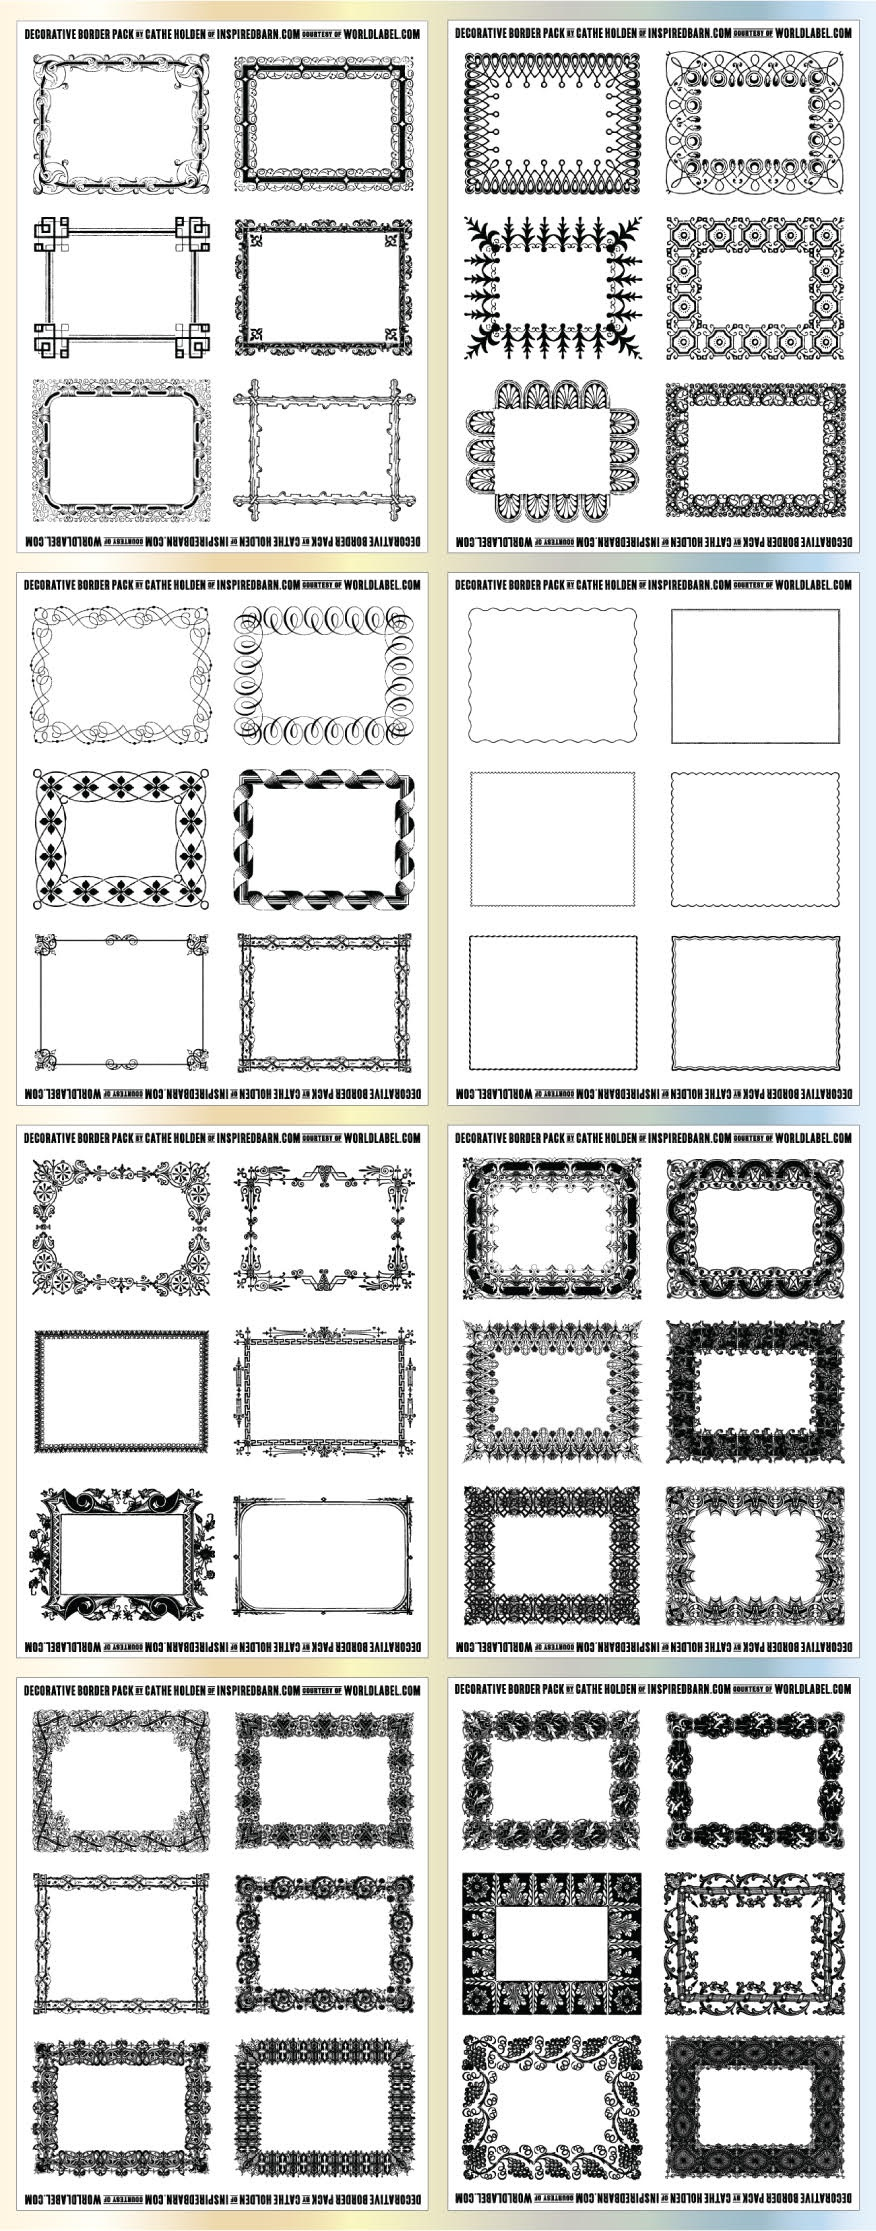 Free Printable Labels & Templates, Label Design @worldlabel Blog - Free Printable File Labels